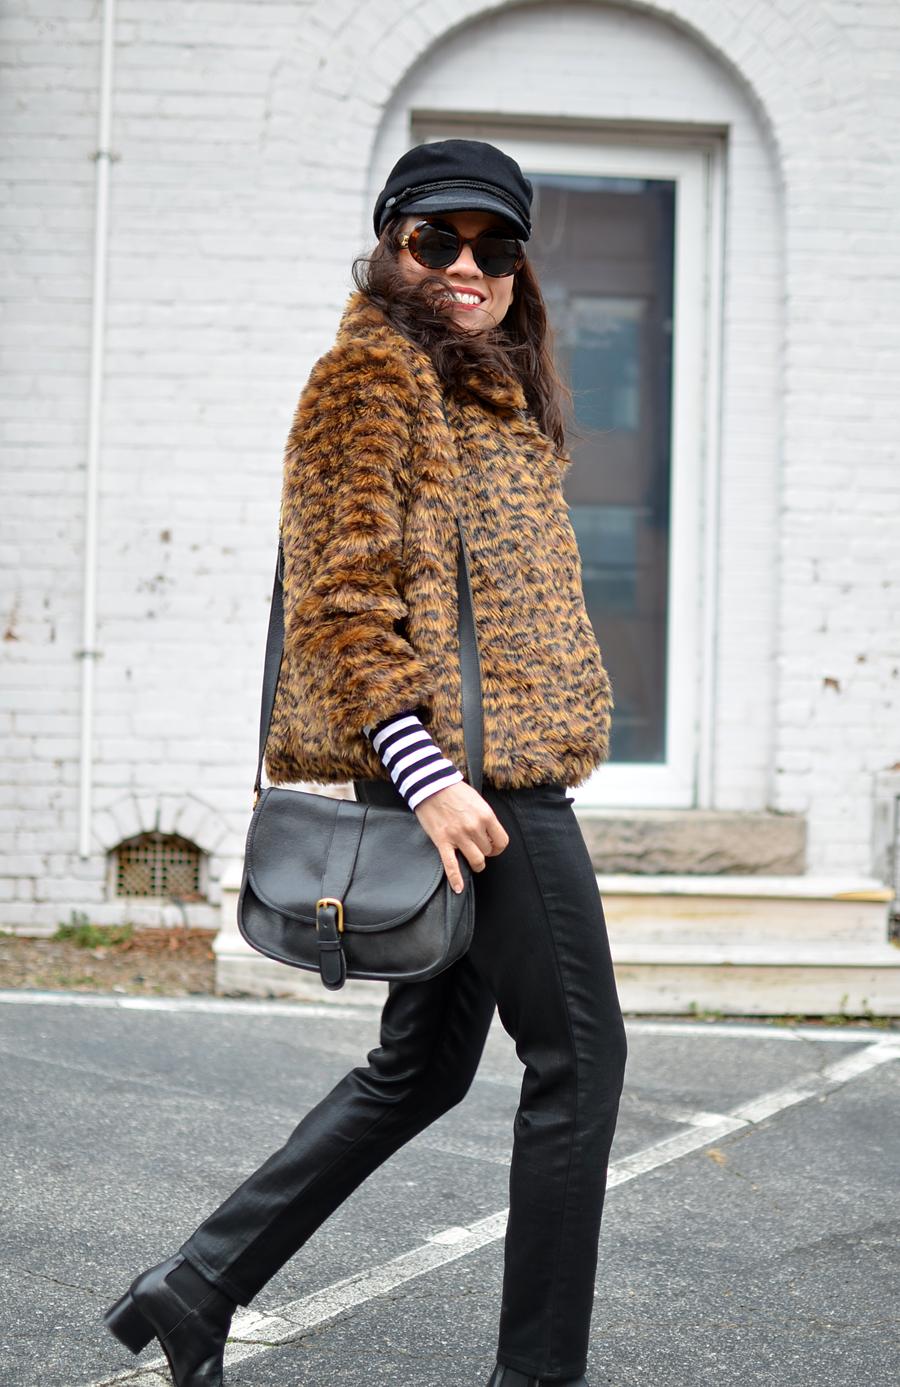 Abrigo leopardo estilo callejero